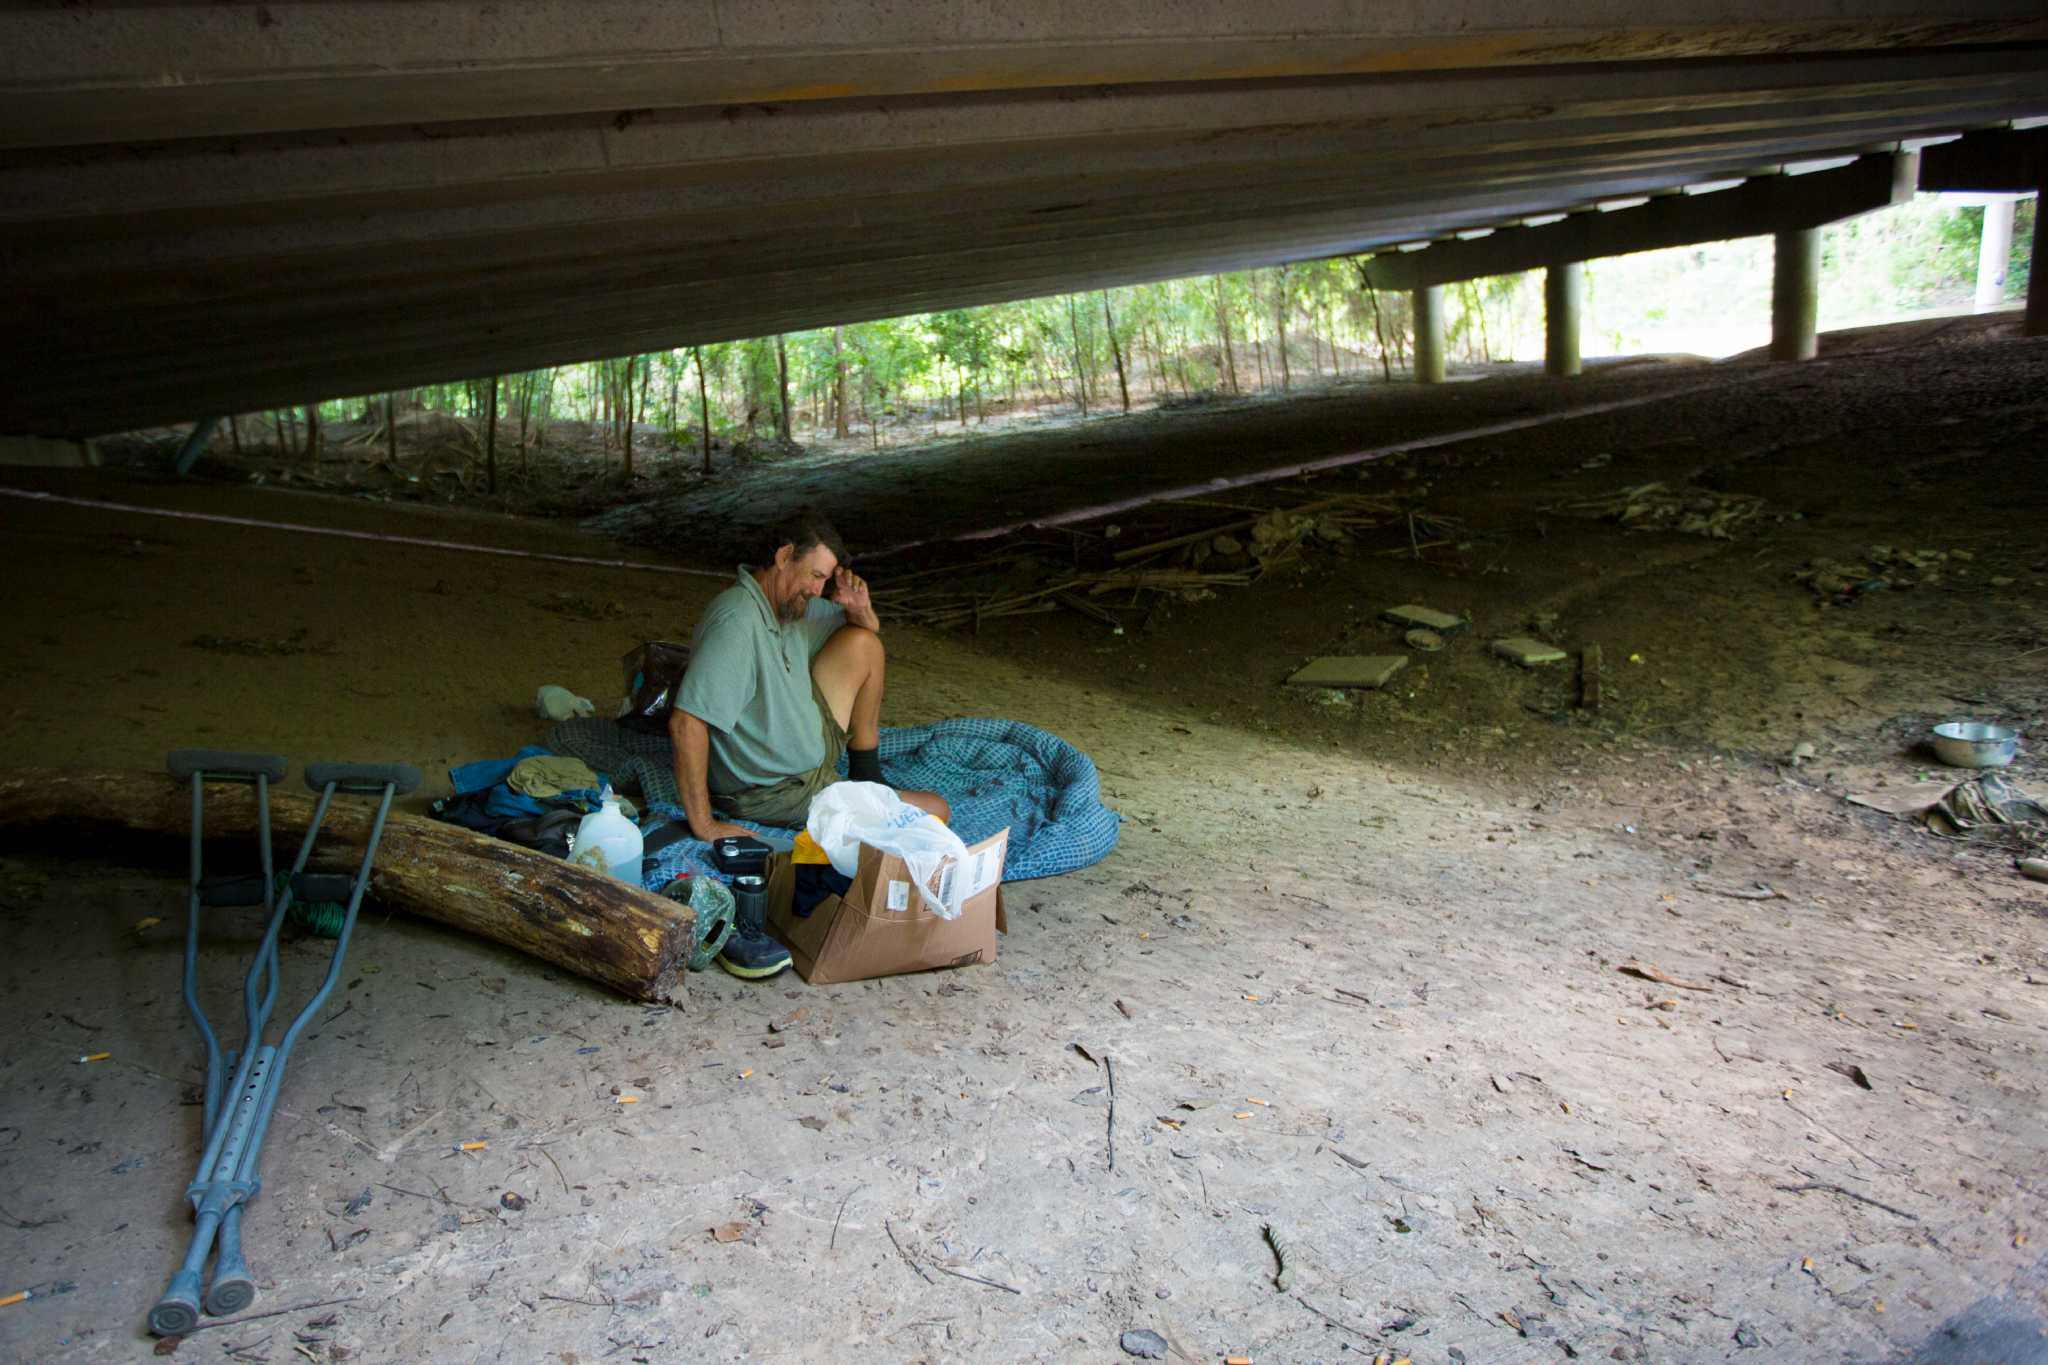 Essay on feeding the homeless